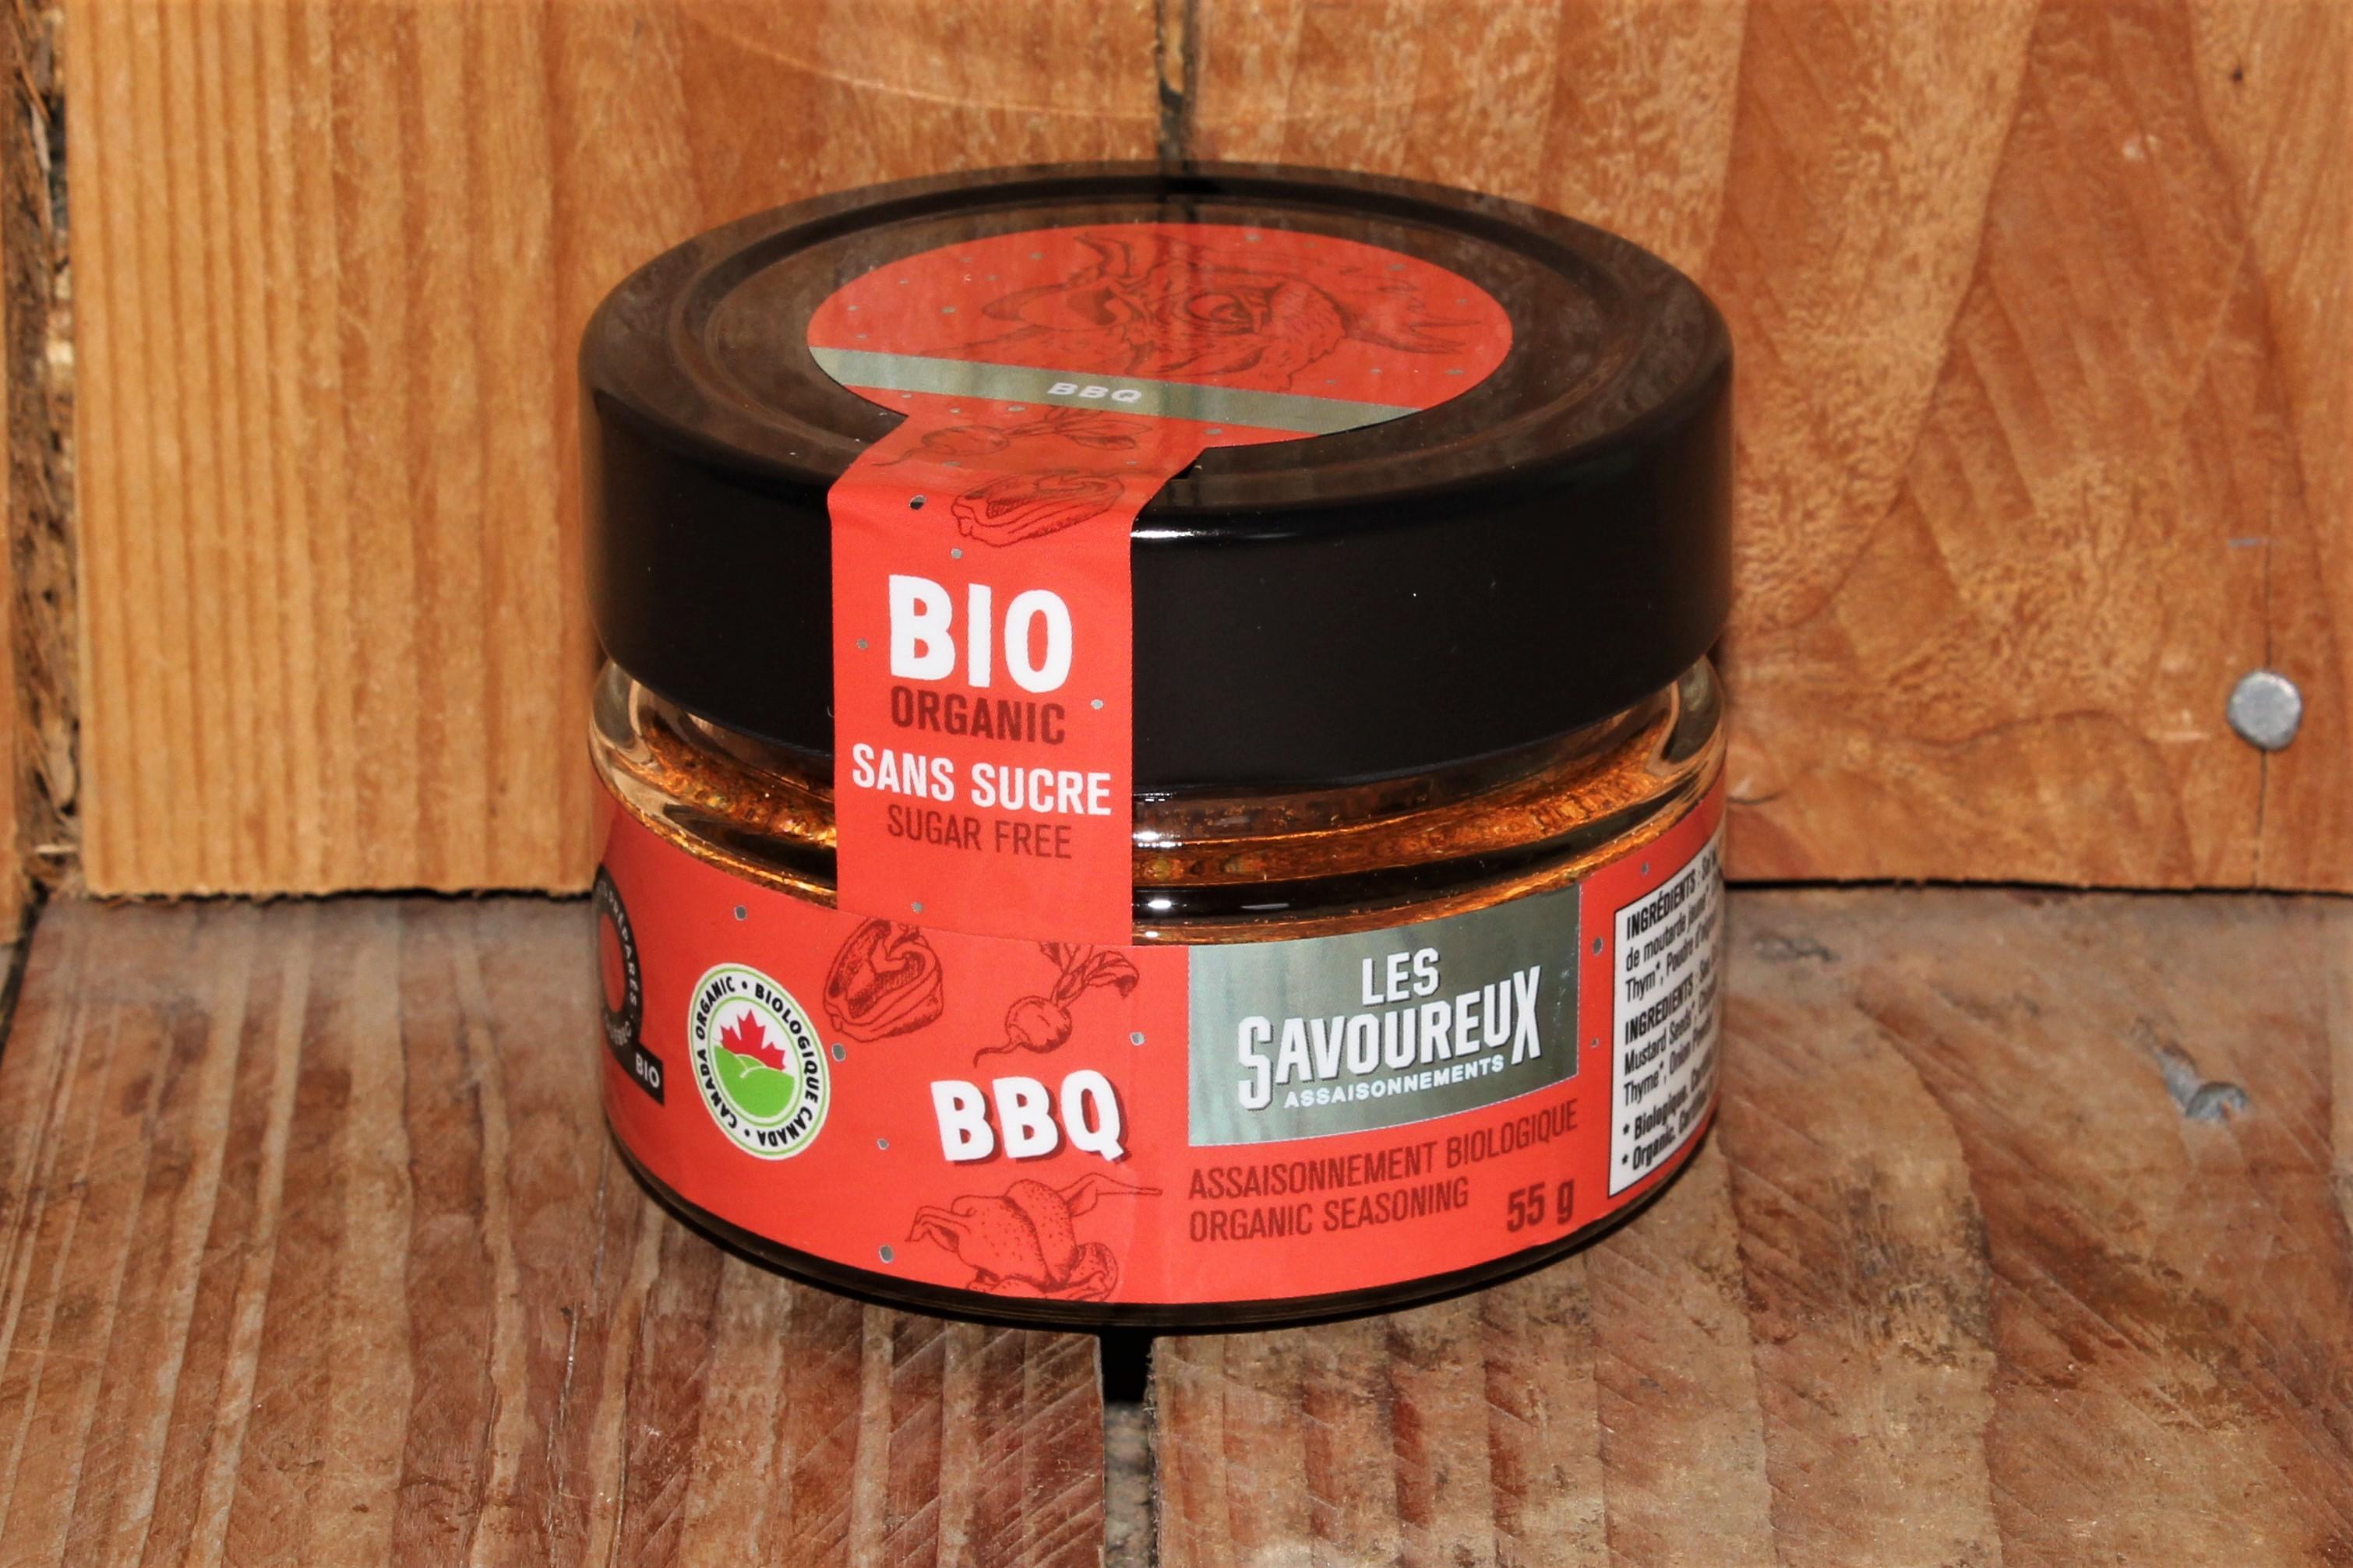 Les Savoureux – Oragnic seasoning, BBQ *sugar-free* (55g)